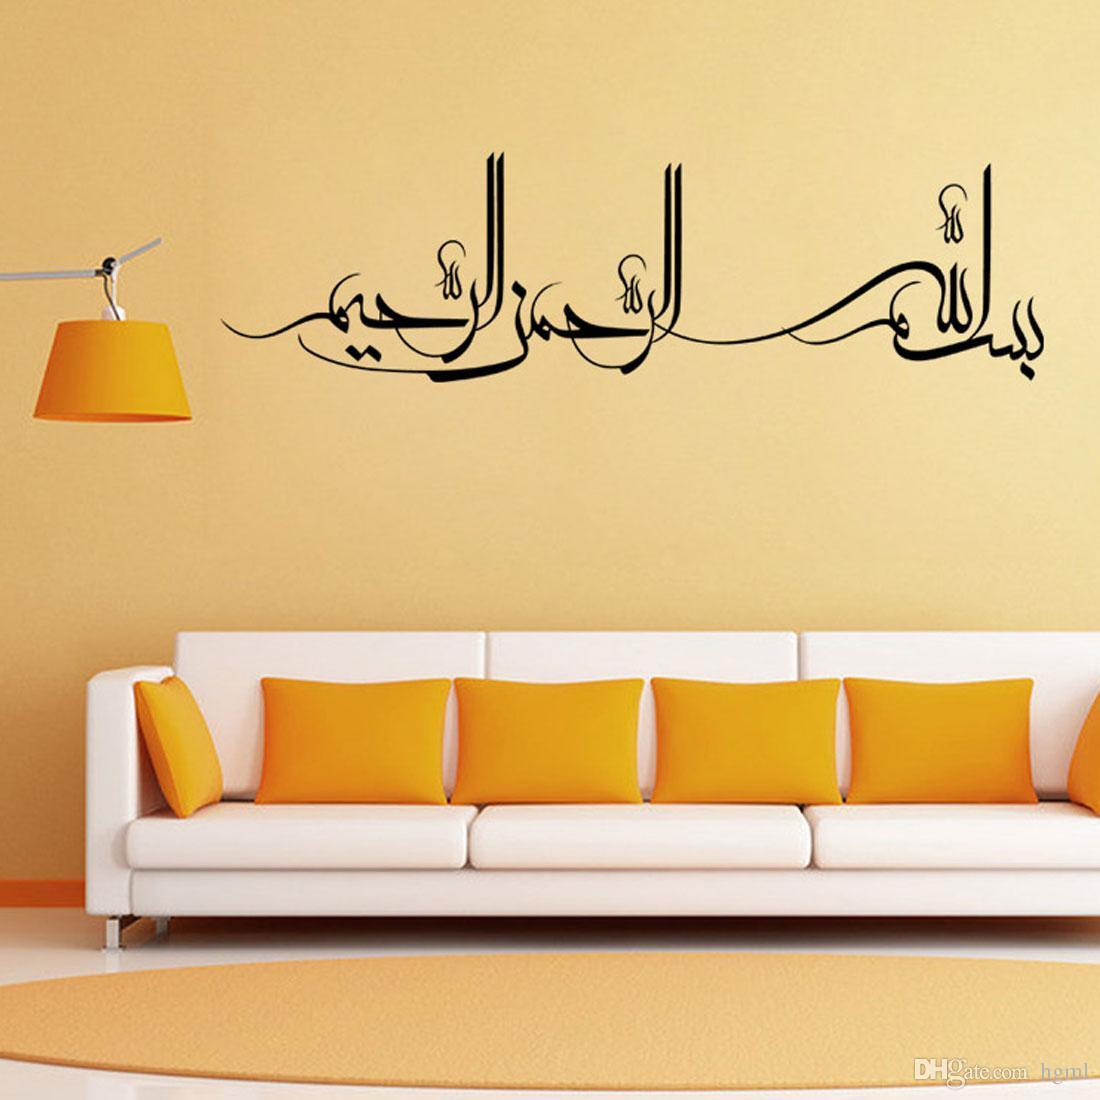 Muslim Stickers Decal Islam Removable Wallpaper Wall Art Islamic ...